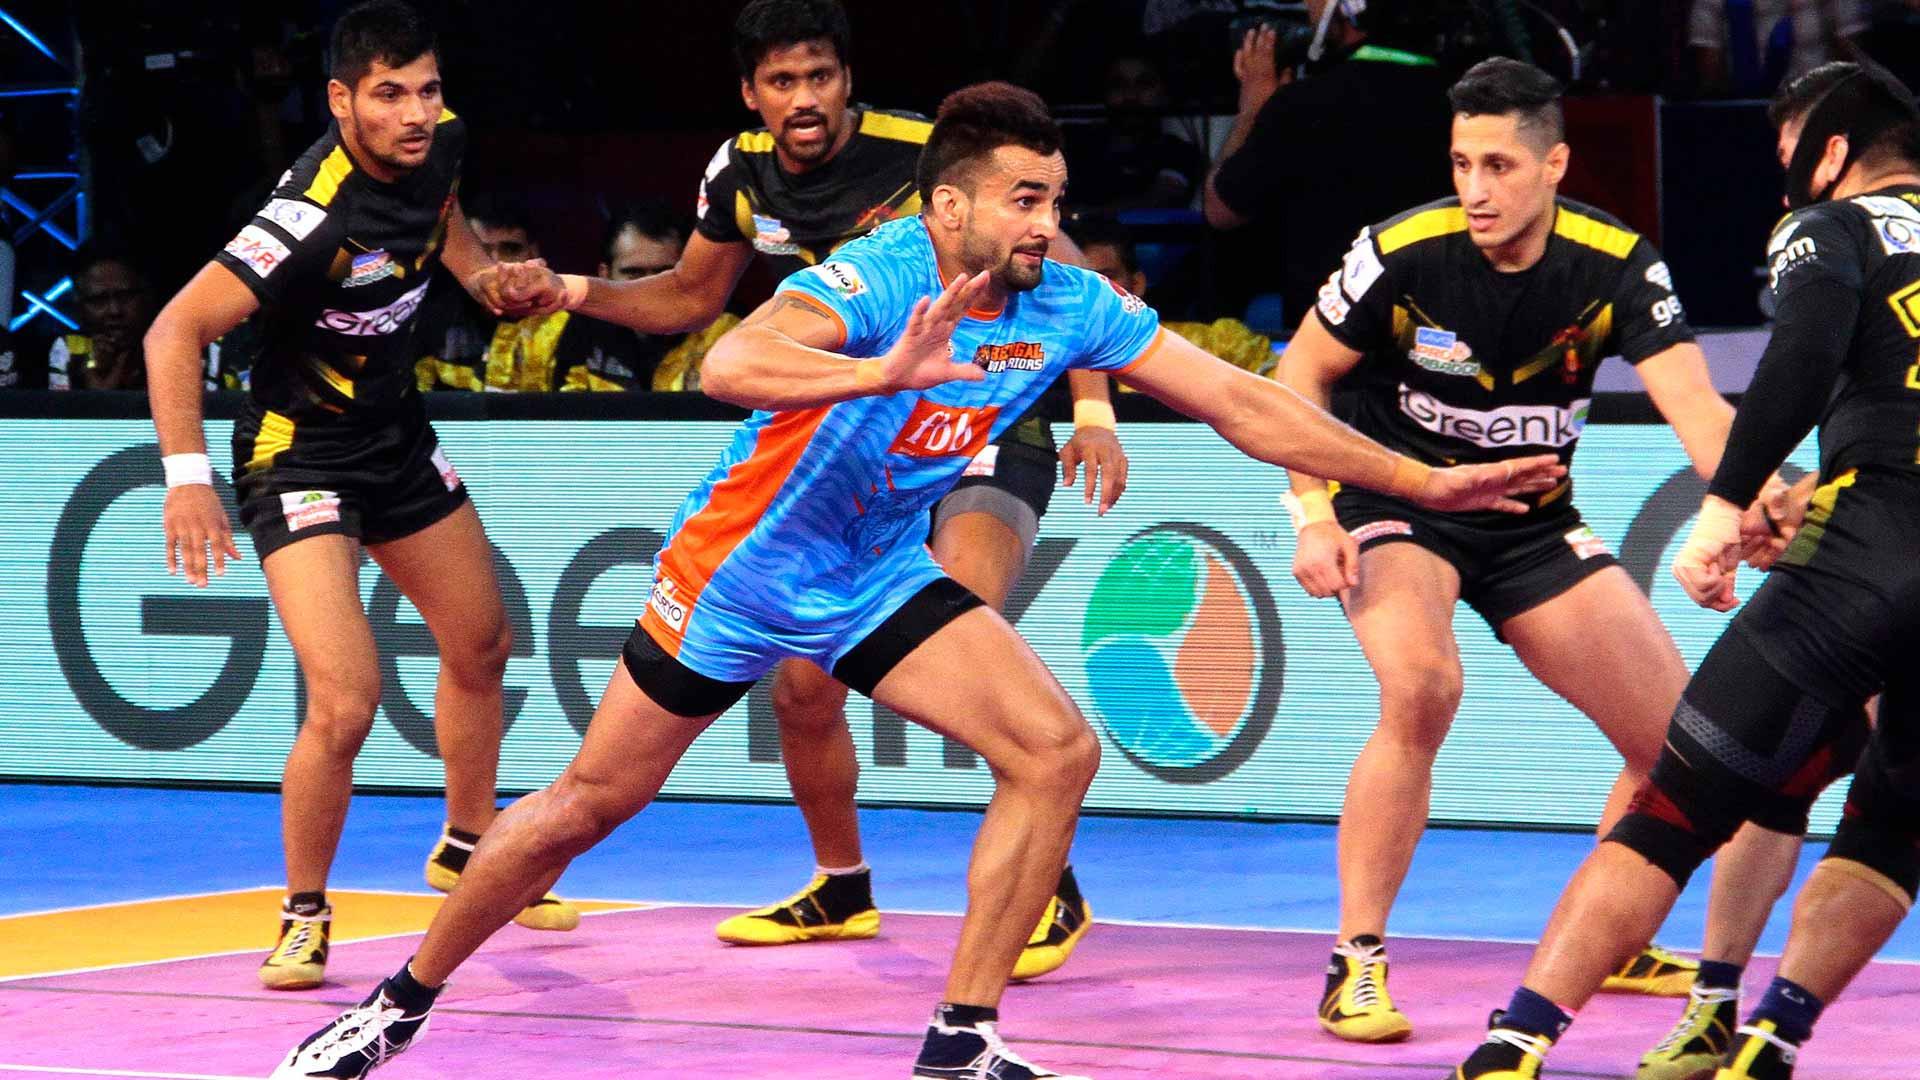 Ran Singh KreedOn Kabaddi League